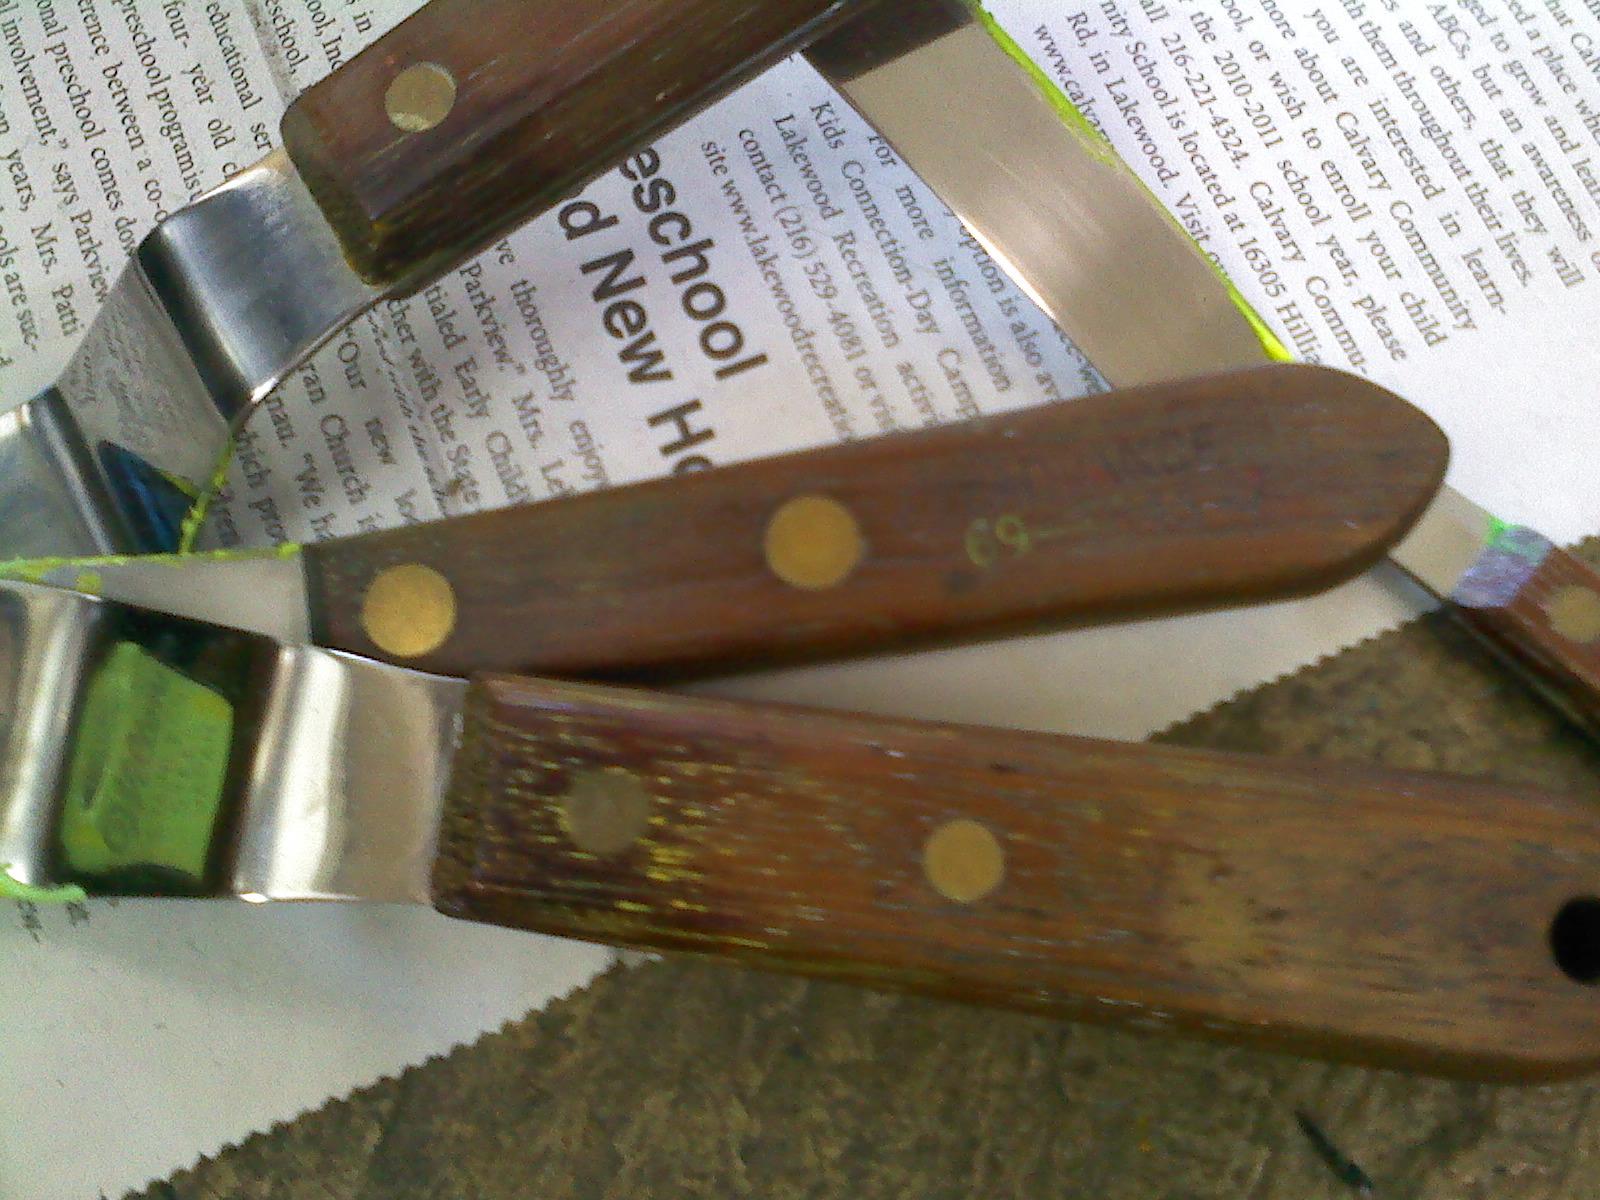 69 ink spatula